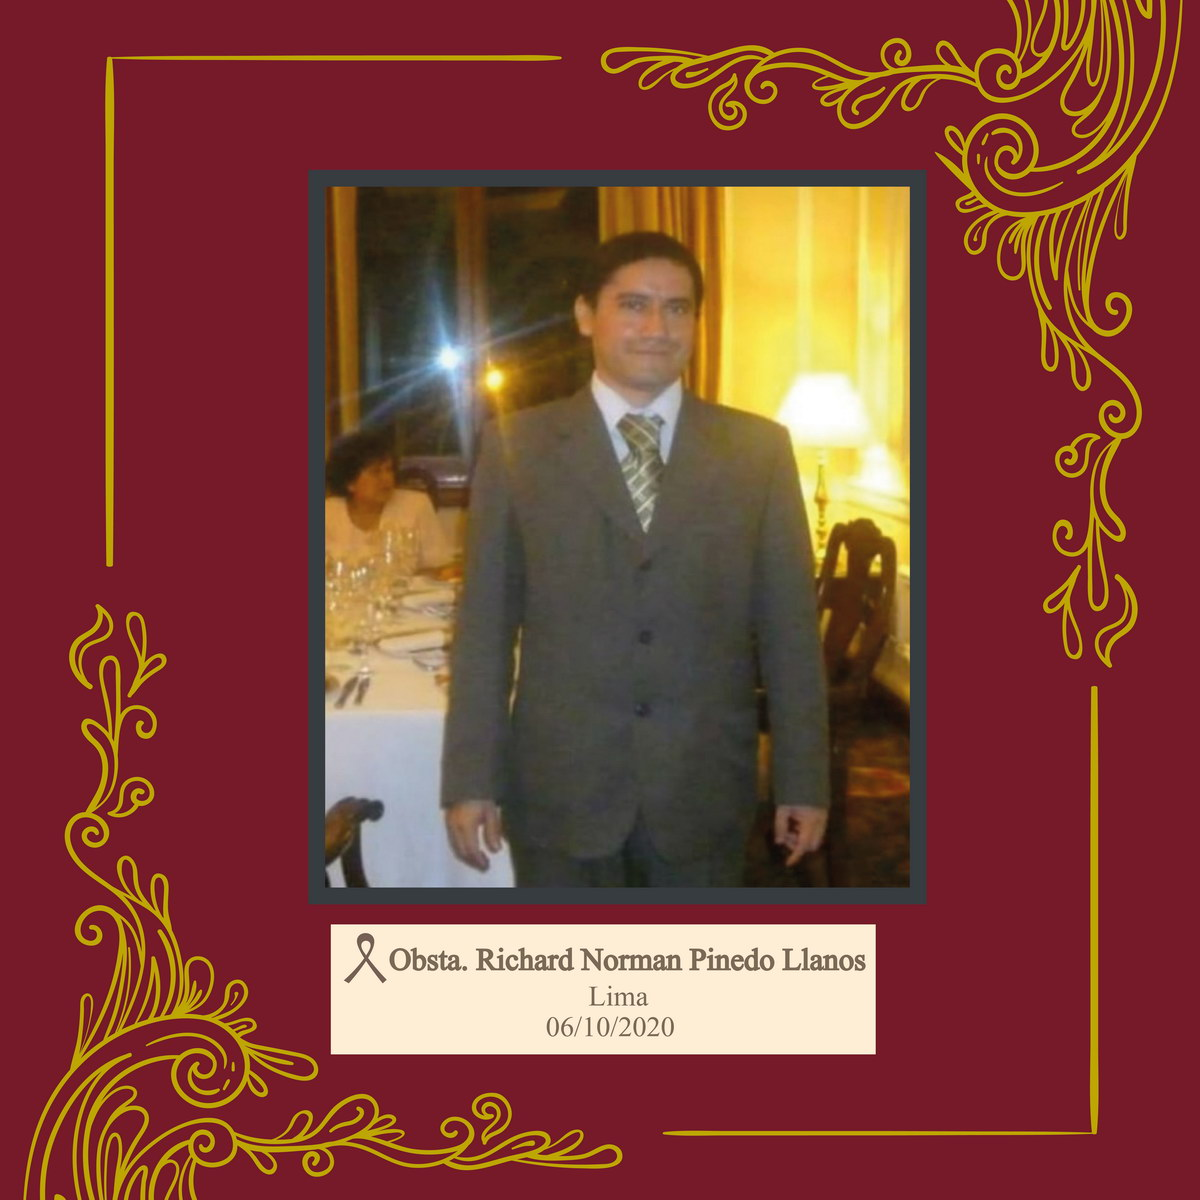 Richard Norman Pinedo Llanos